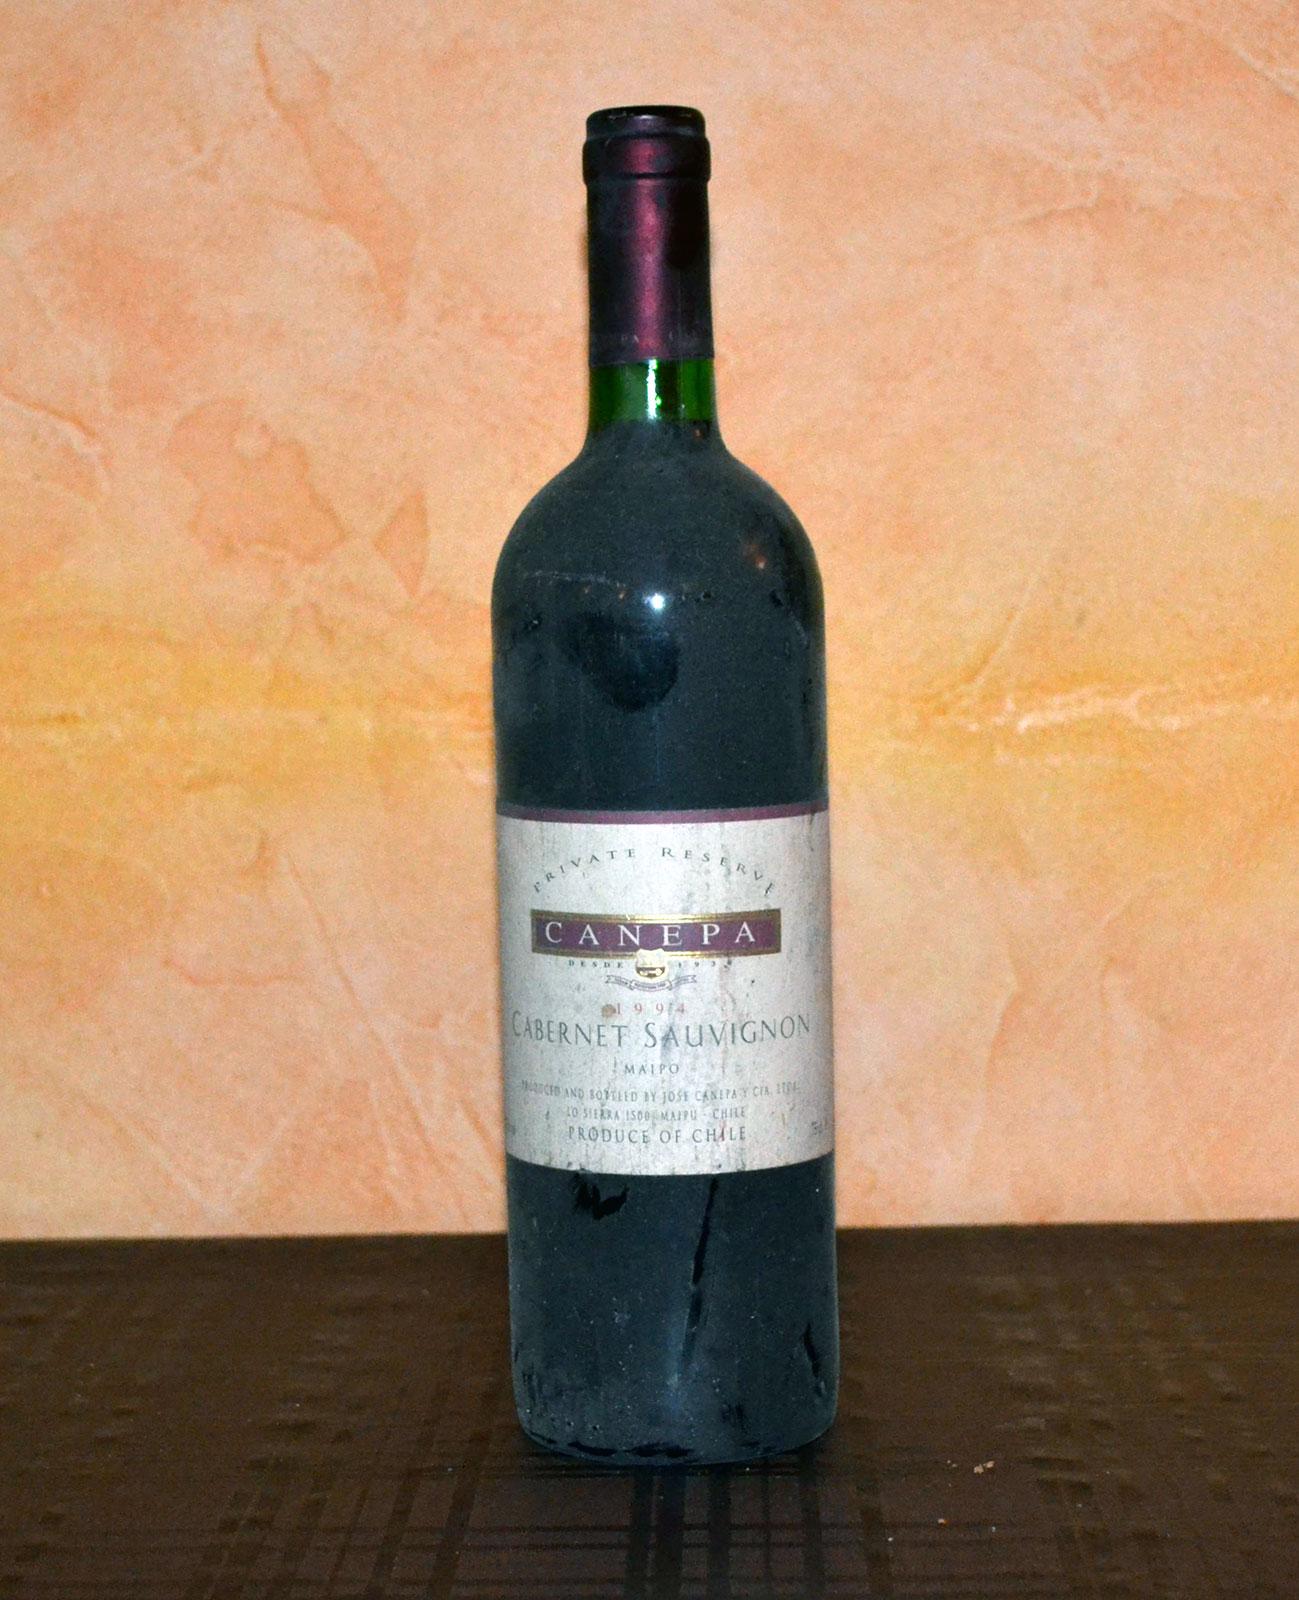 Canepa Cabernet Sauvignon Red 1994